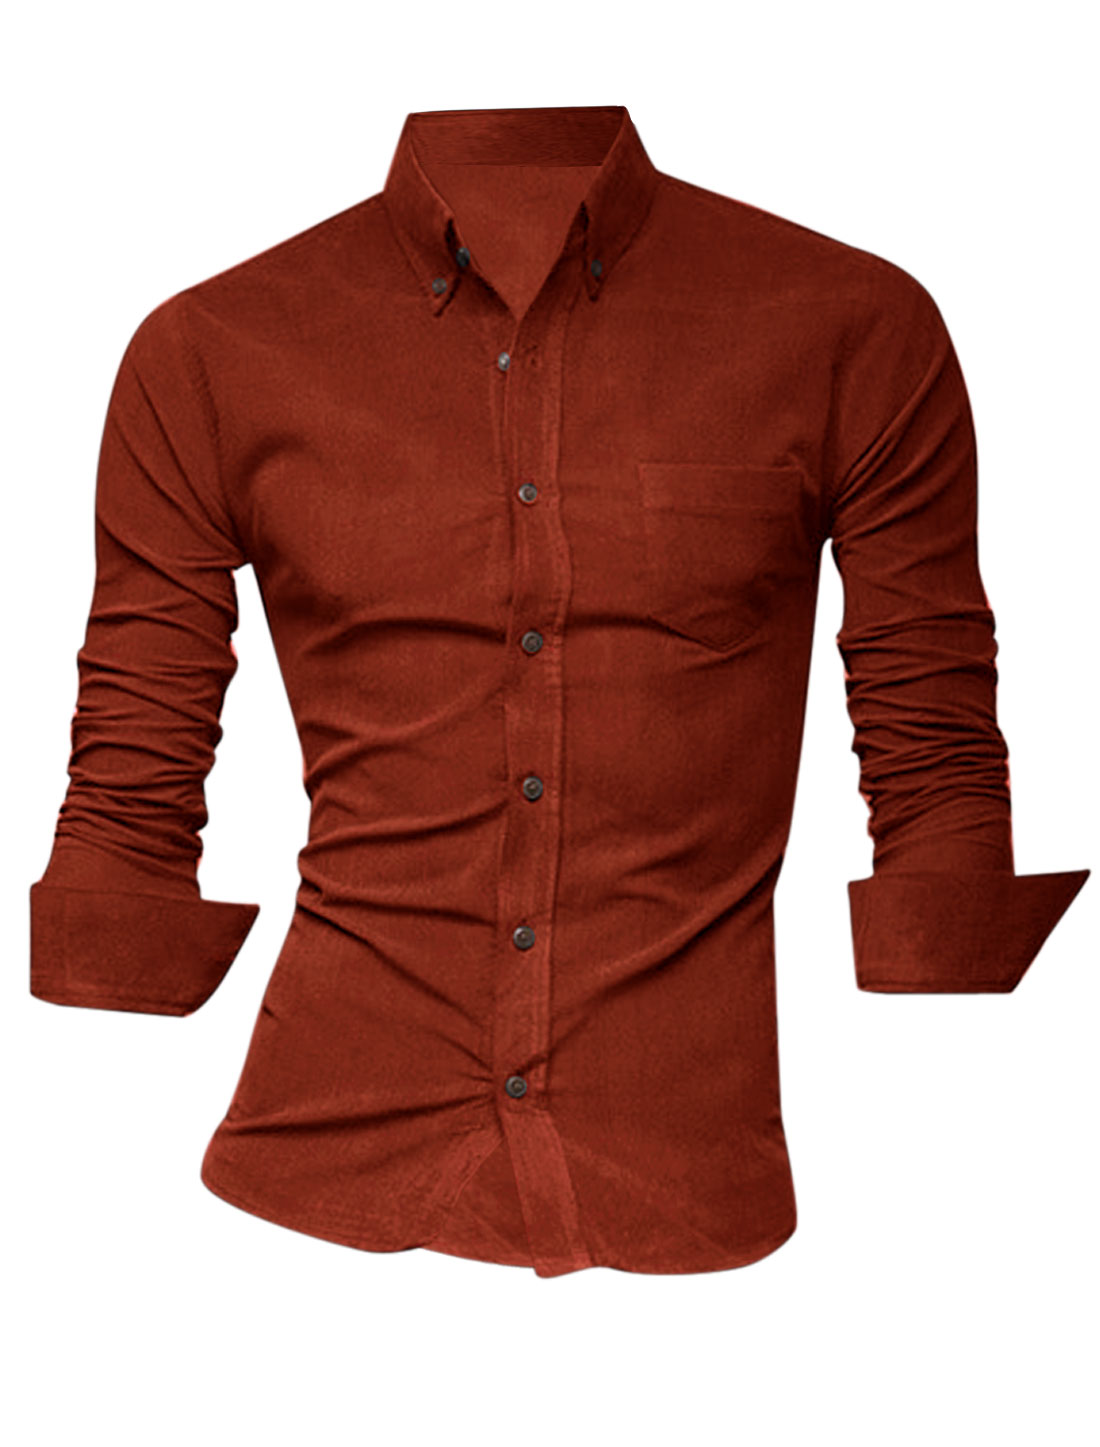 Men Point Collar Single Breast Pocket Leisure Shirt Orange Red M